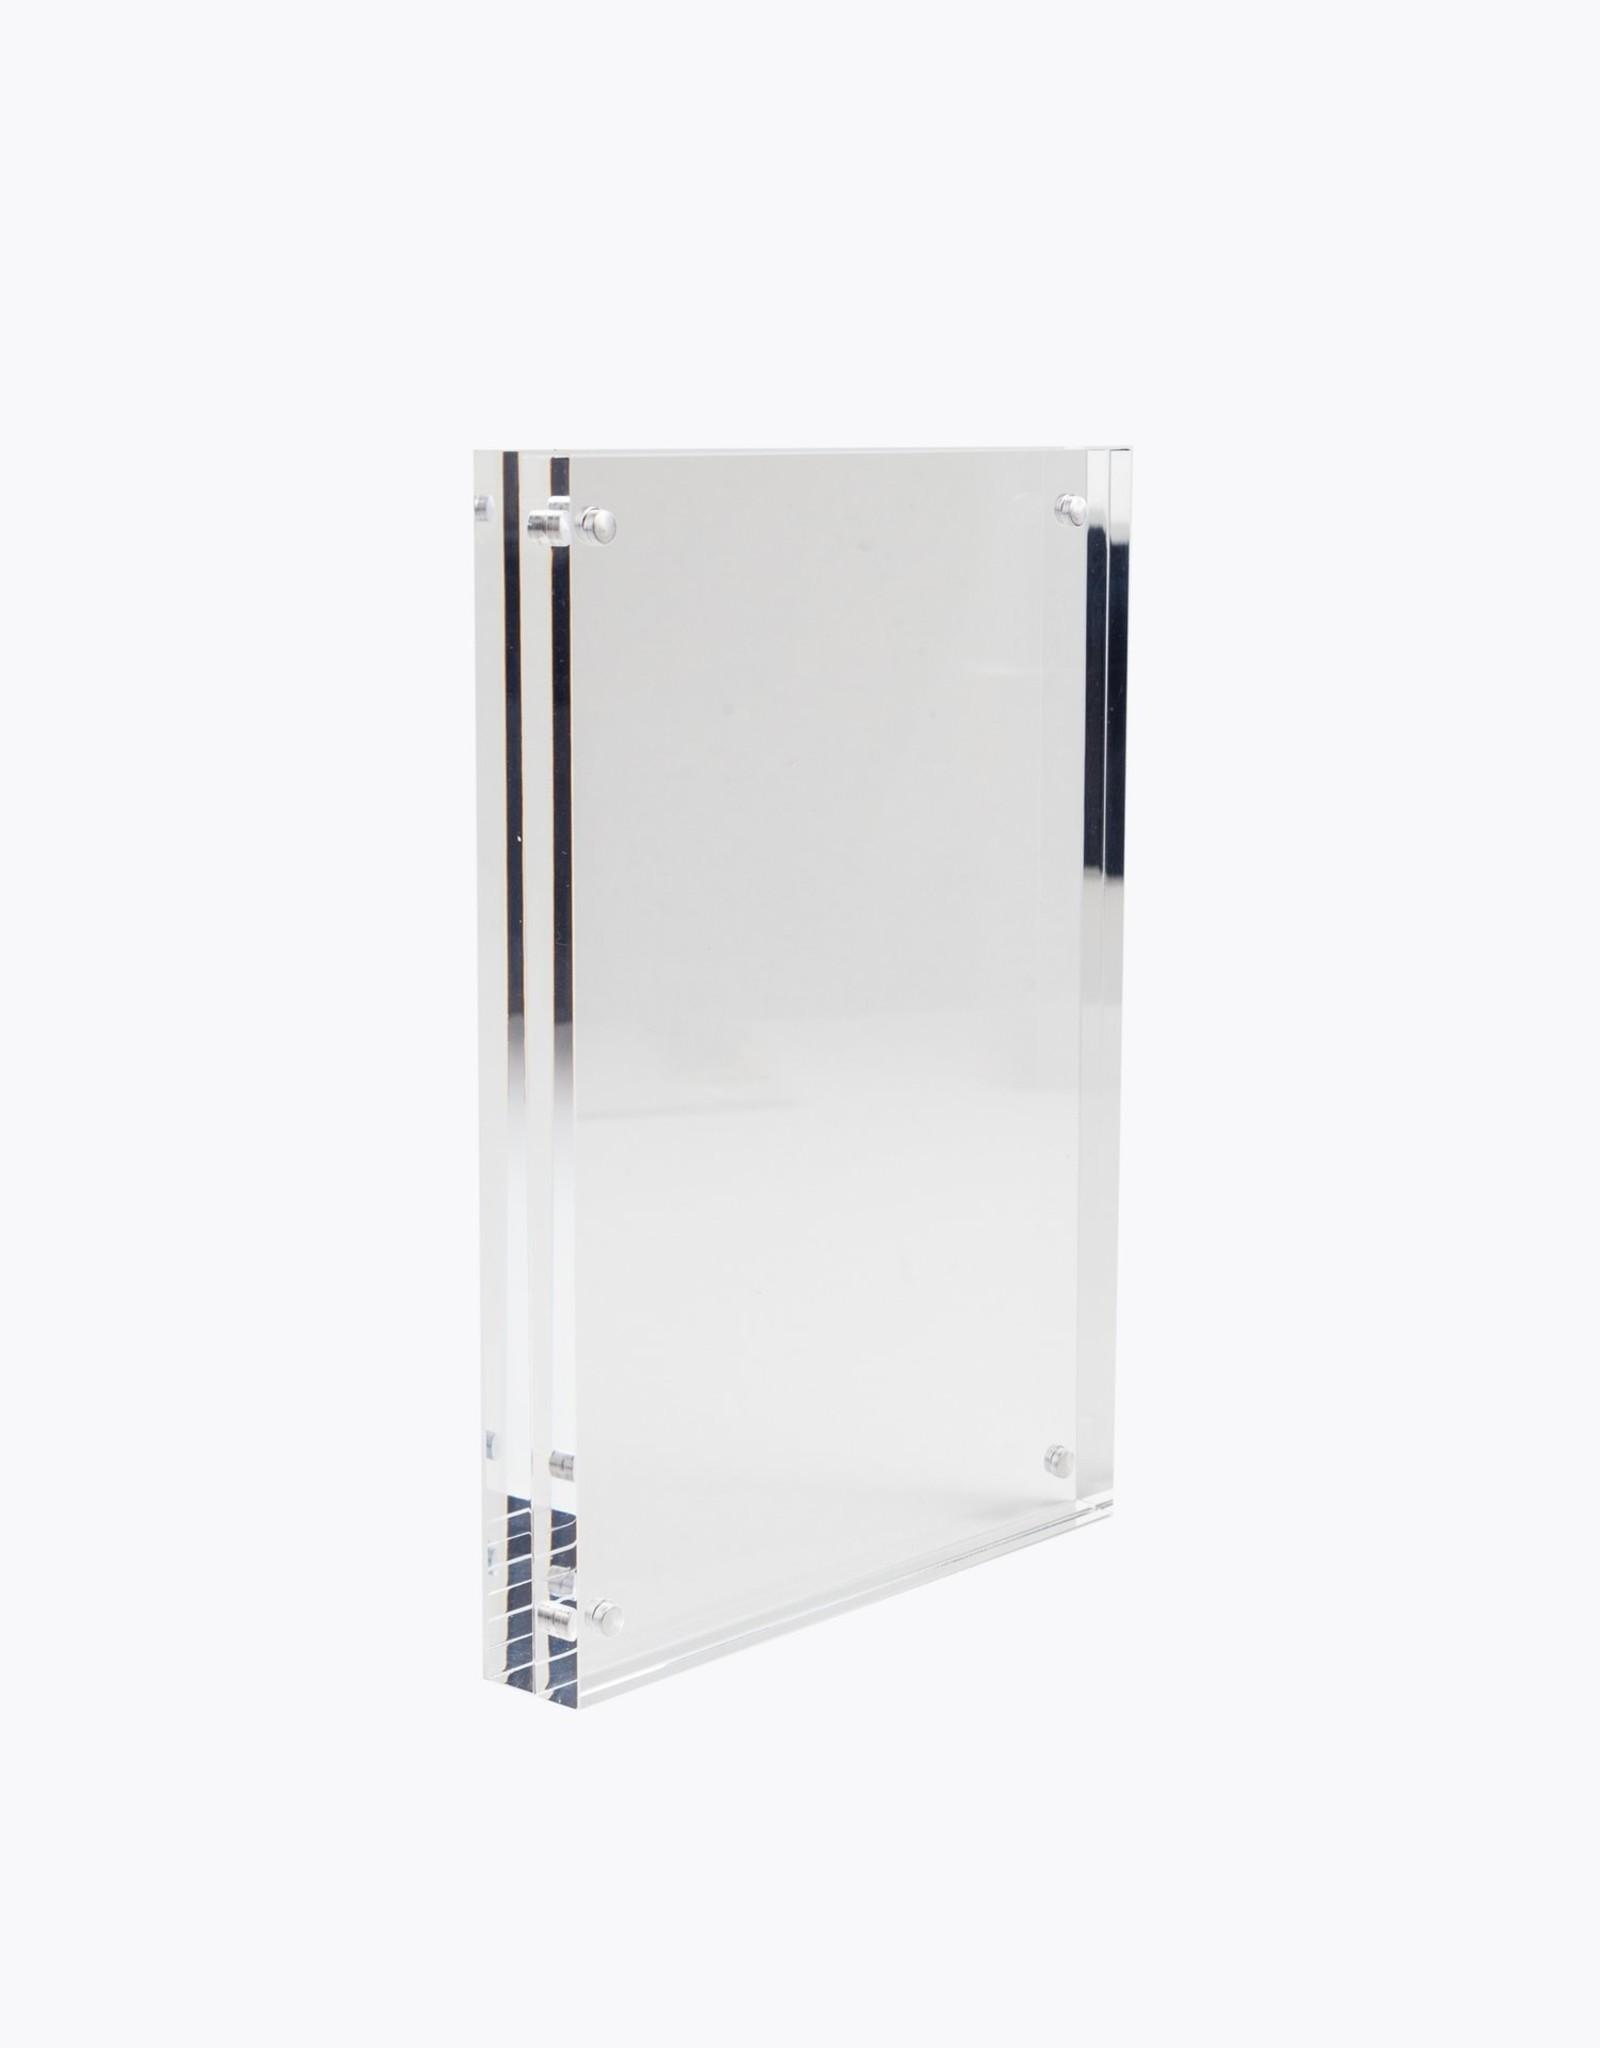 Poketo Acrylic Photo Frame